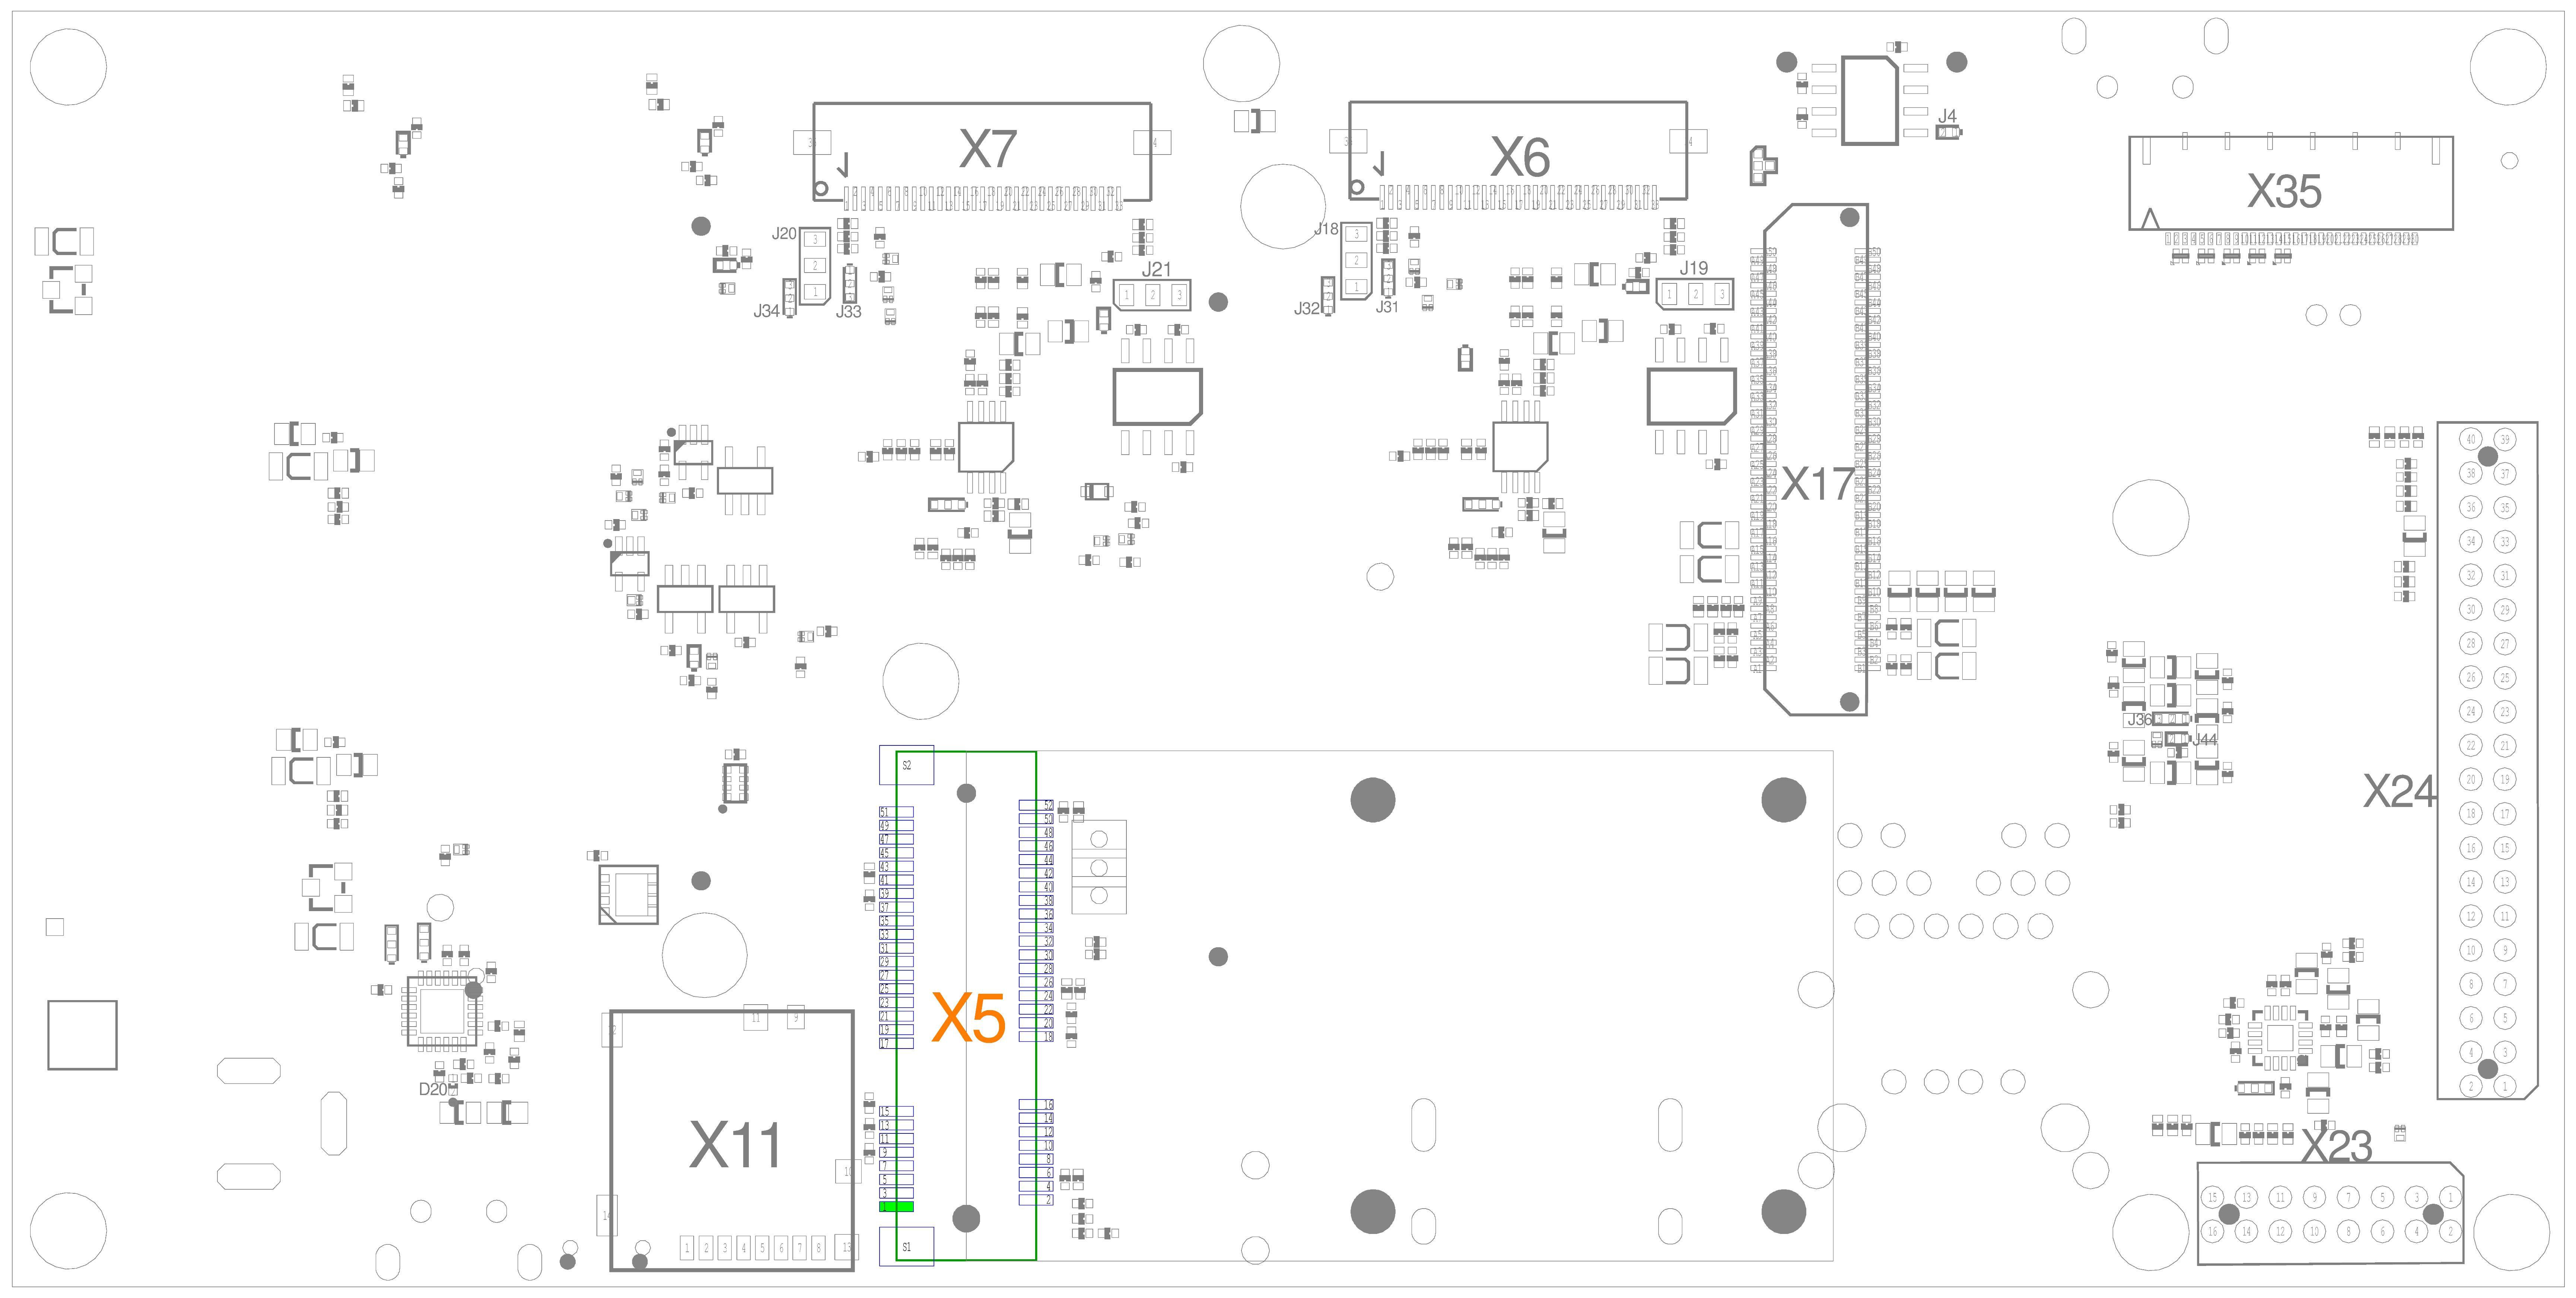 Mini PCIe Connector (X5)